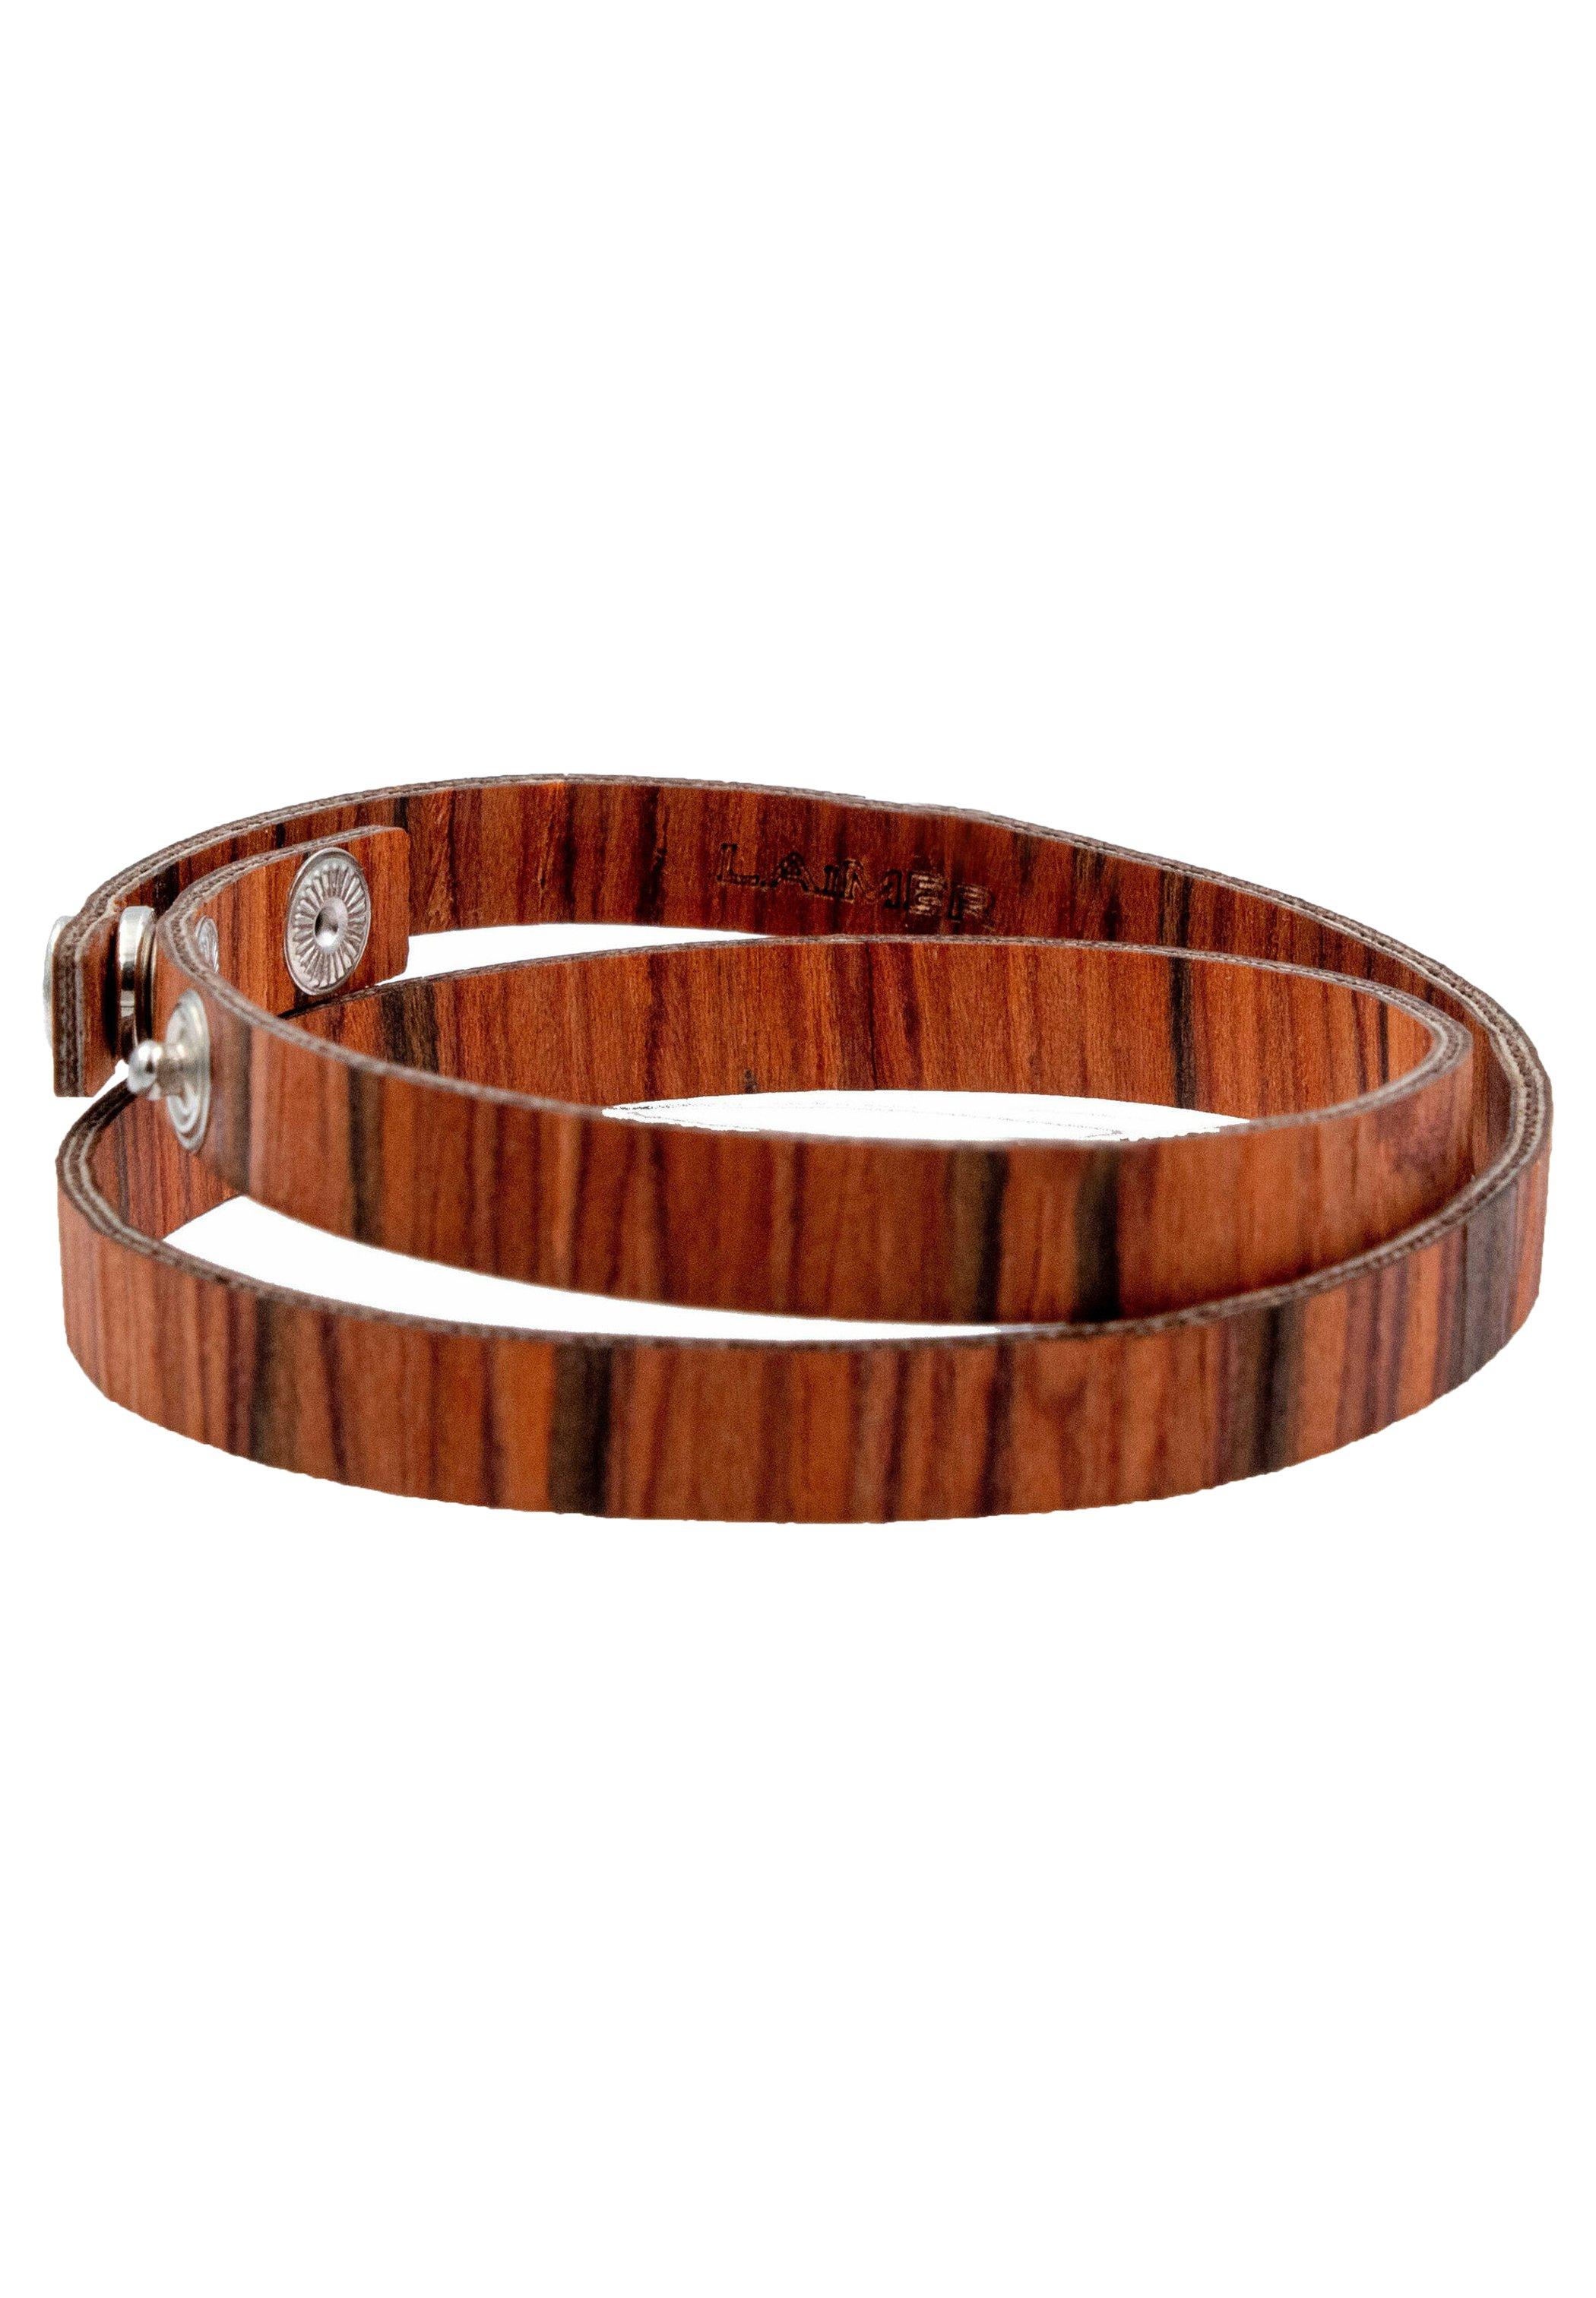 Homme LAIMER WICKEL-ARMBAND AUS ROSENHOLZ - S1112 - Bracelet